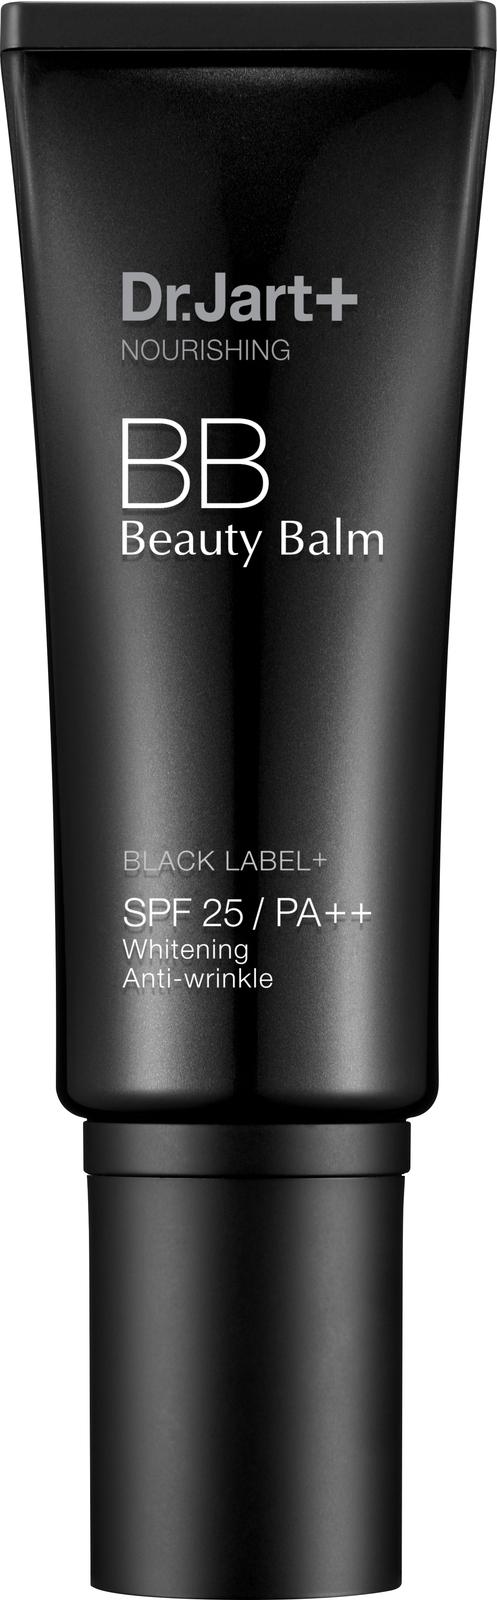 BB Крем Dr.Jart+ Black Label, питательный, SPF25/PA++, 40 мл dr jart bb крем black label питательный с spf25 pa bb крем black label питательный с spf25 pa